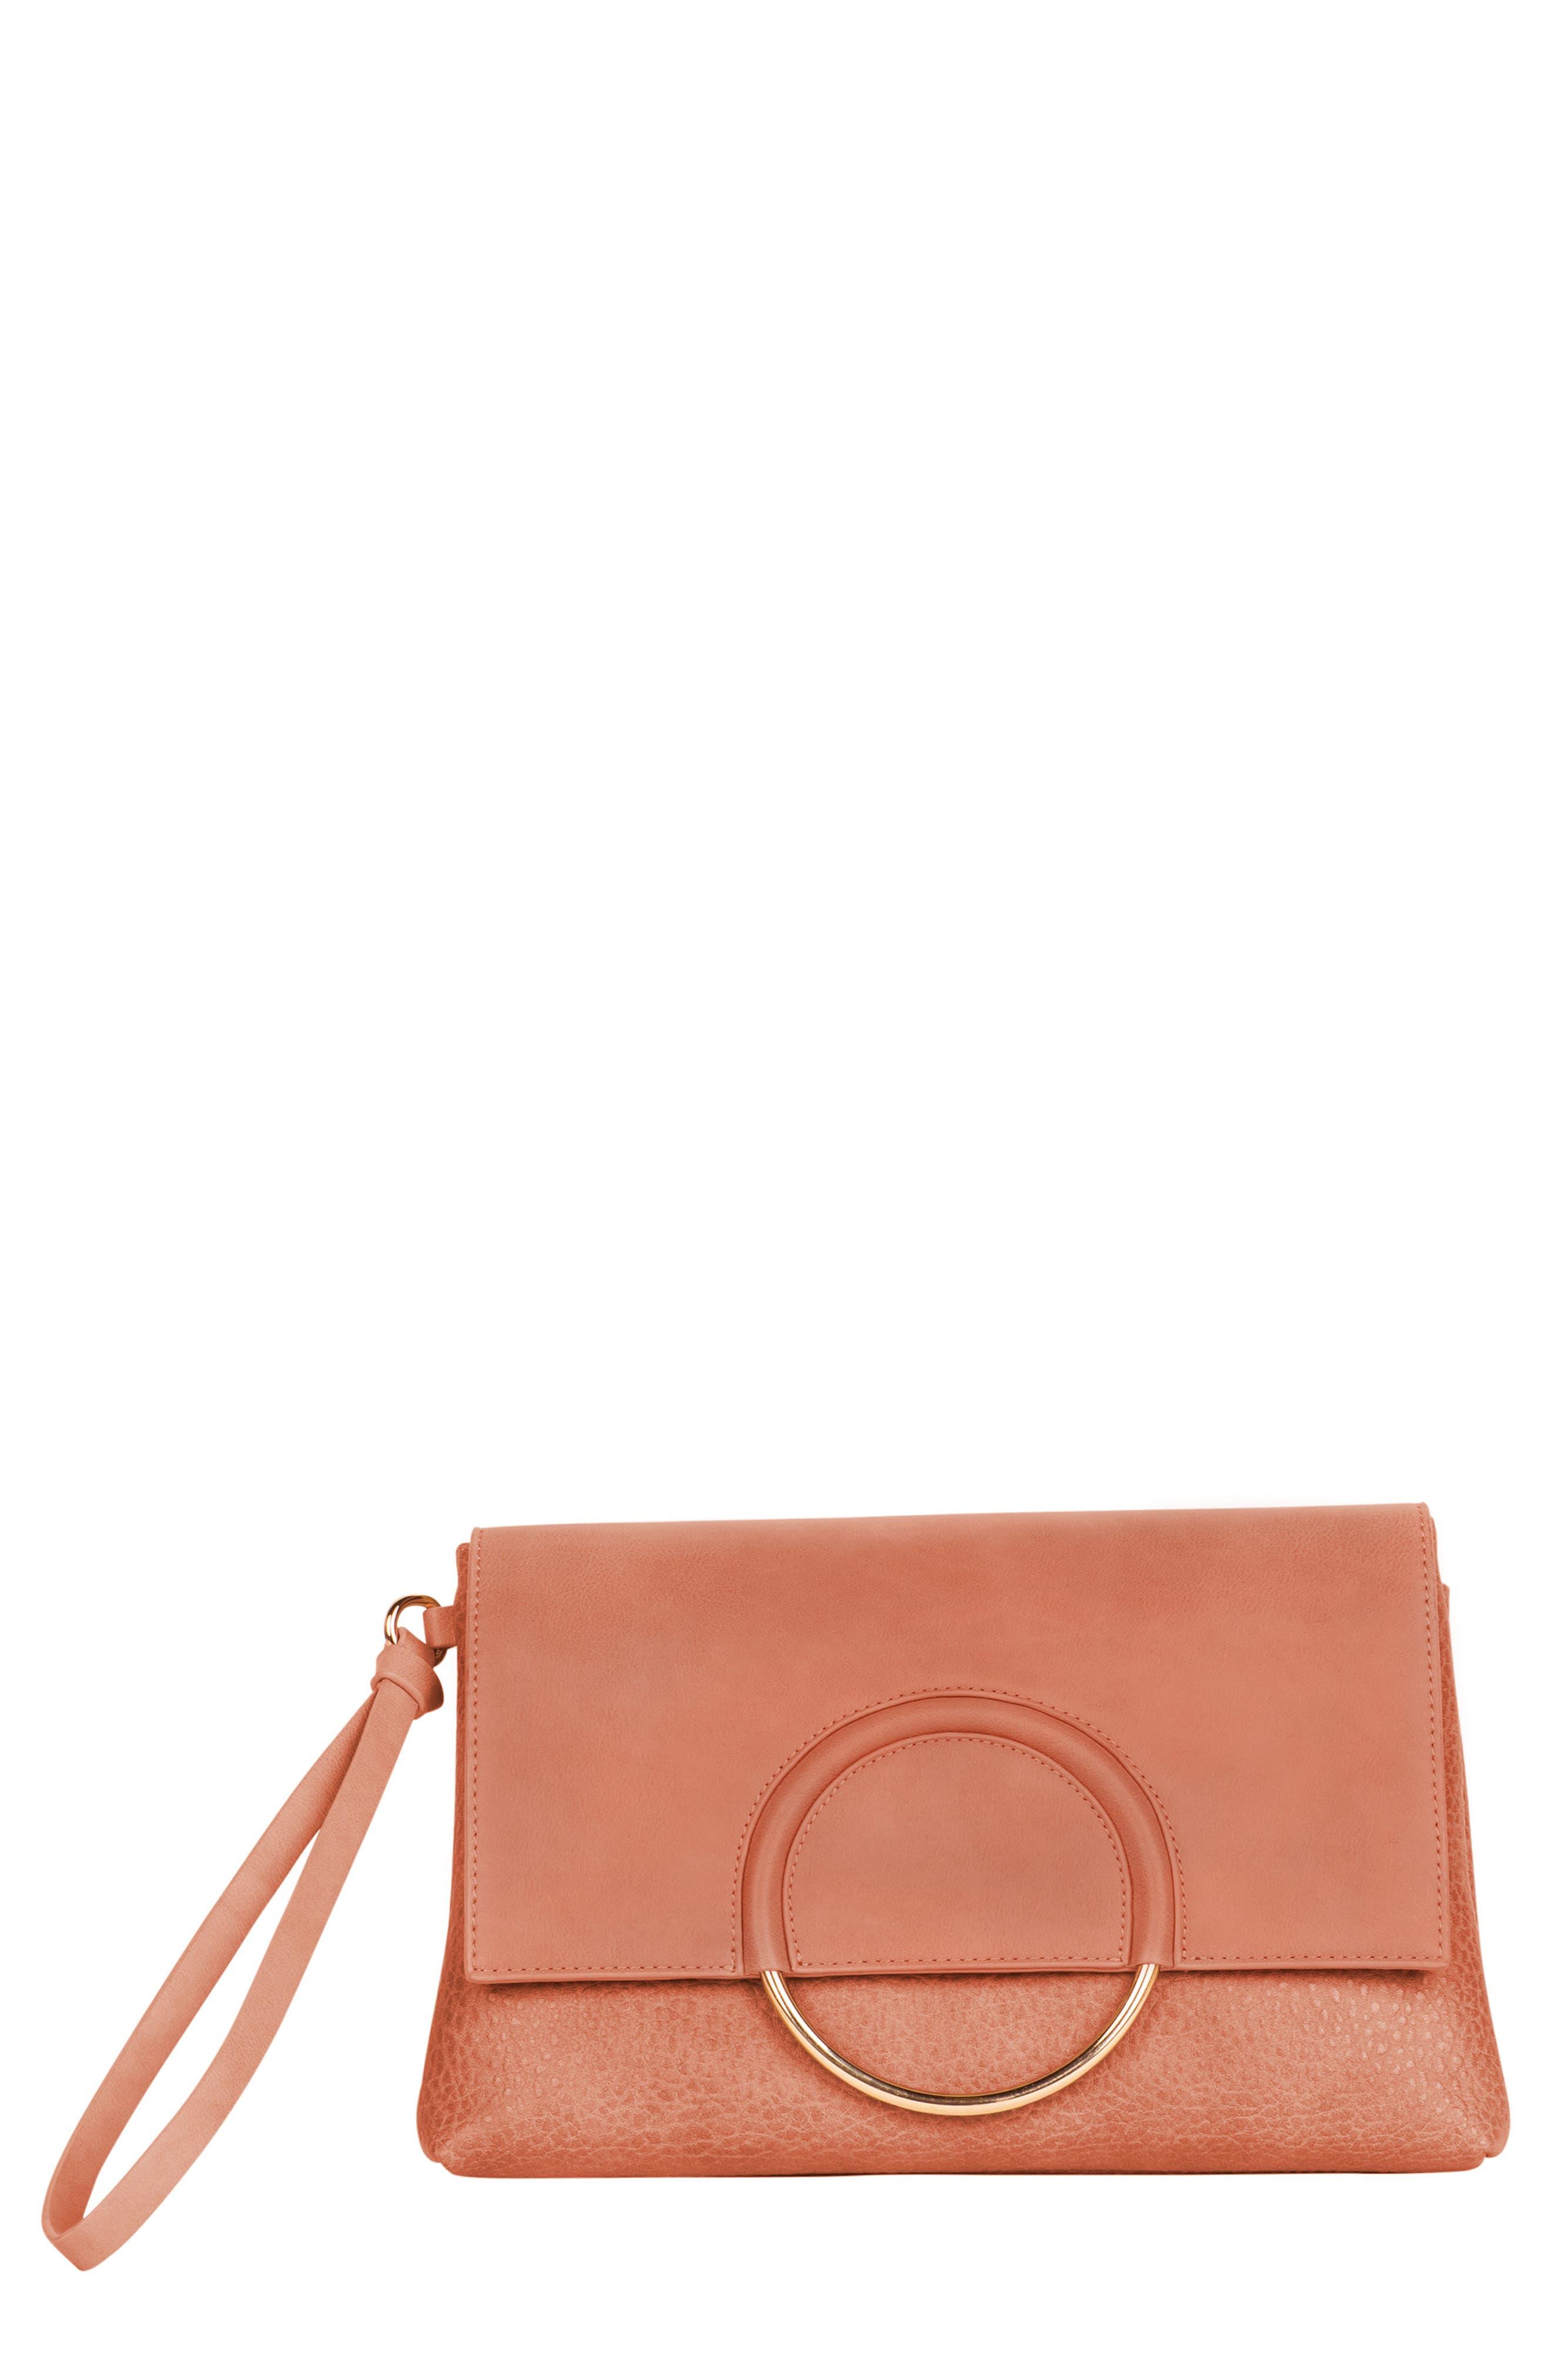 Custom Vegan Leather Wristlet Clutch,                             Main thumbnail 1, color,                             ROSE PINK